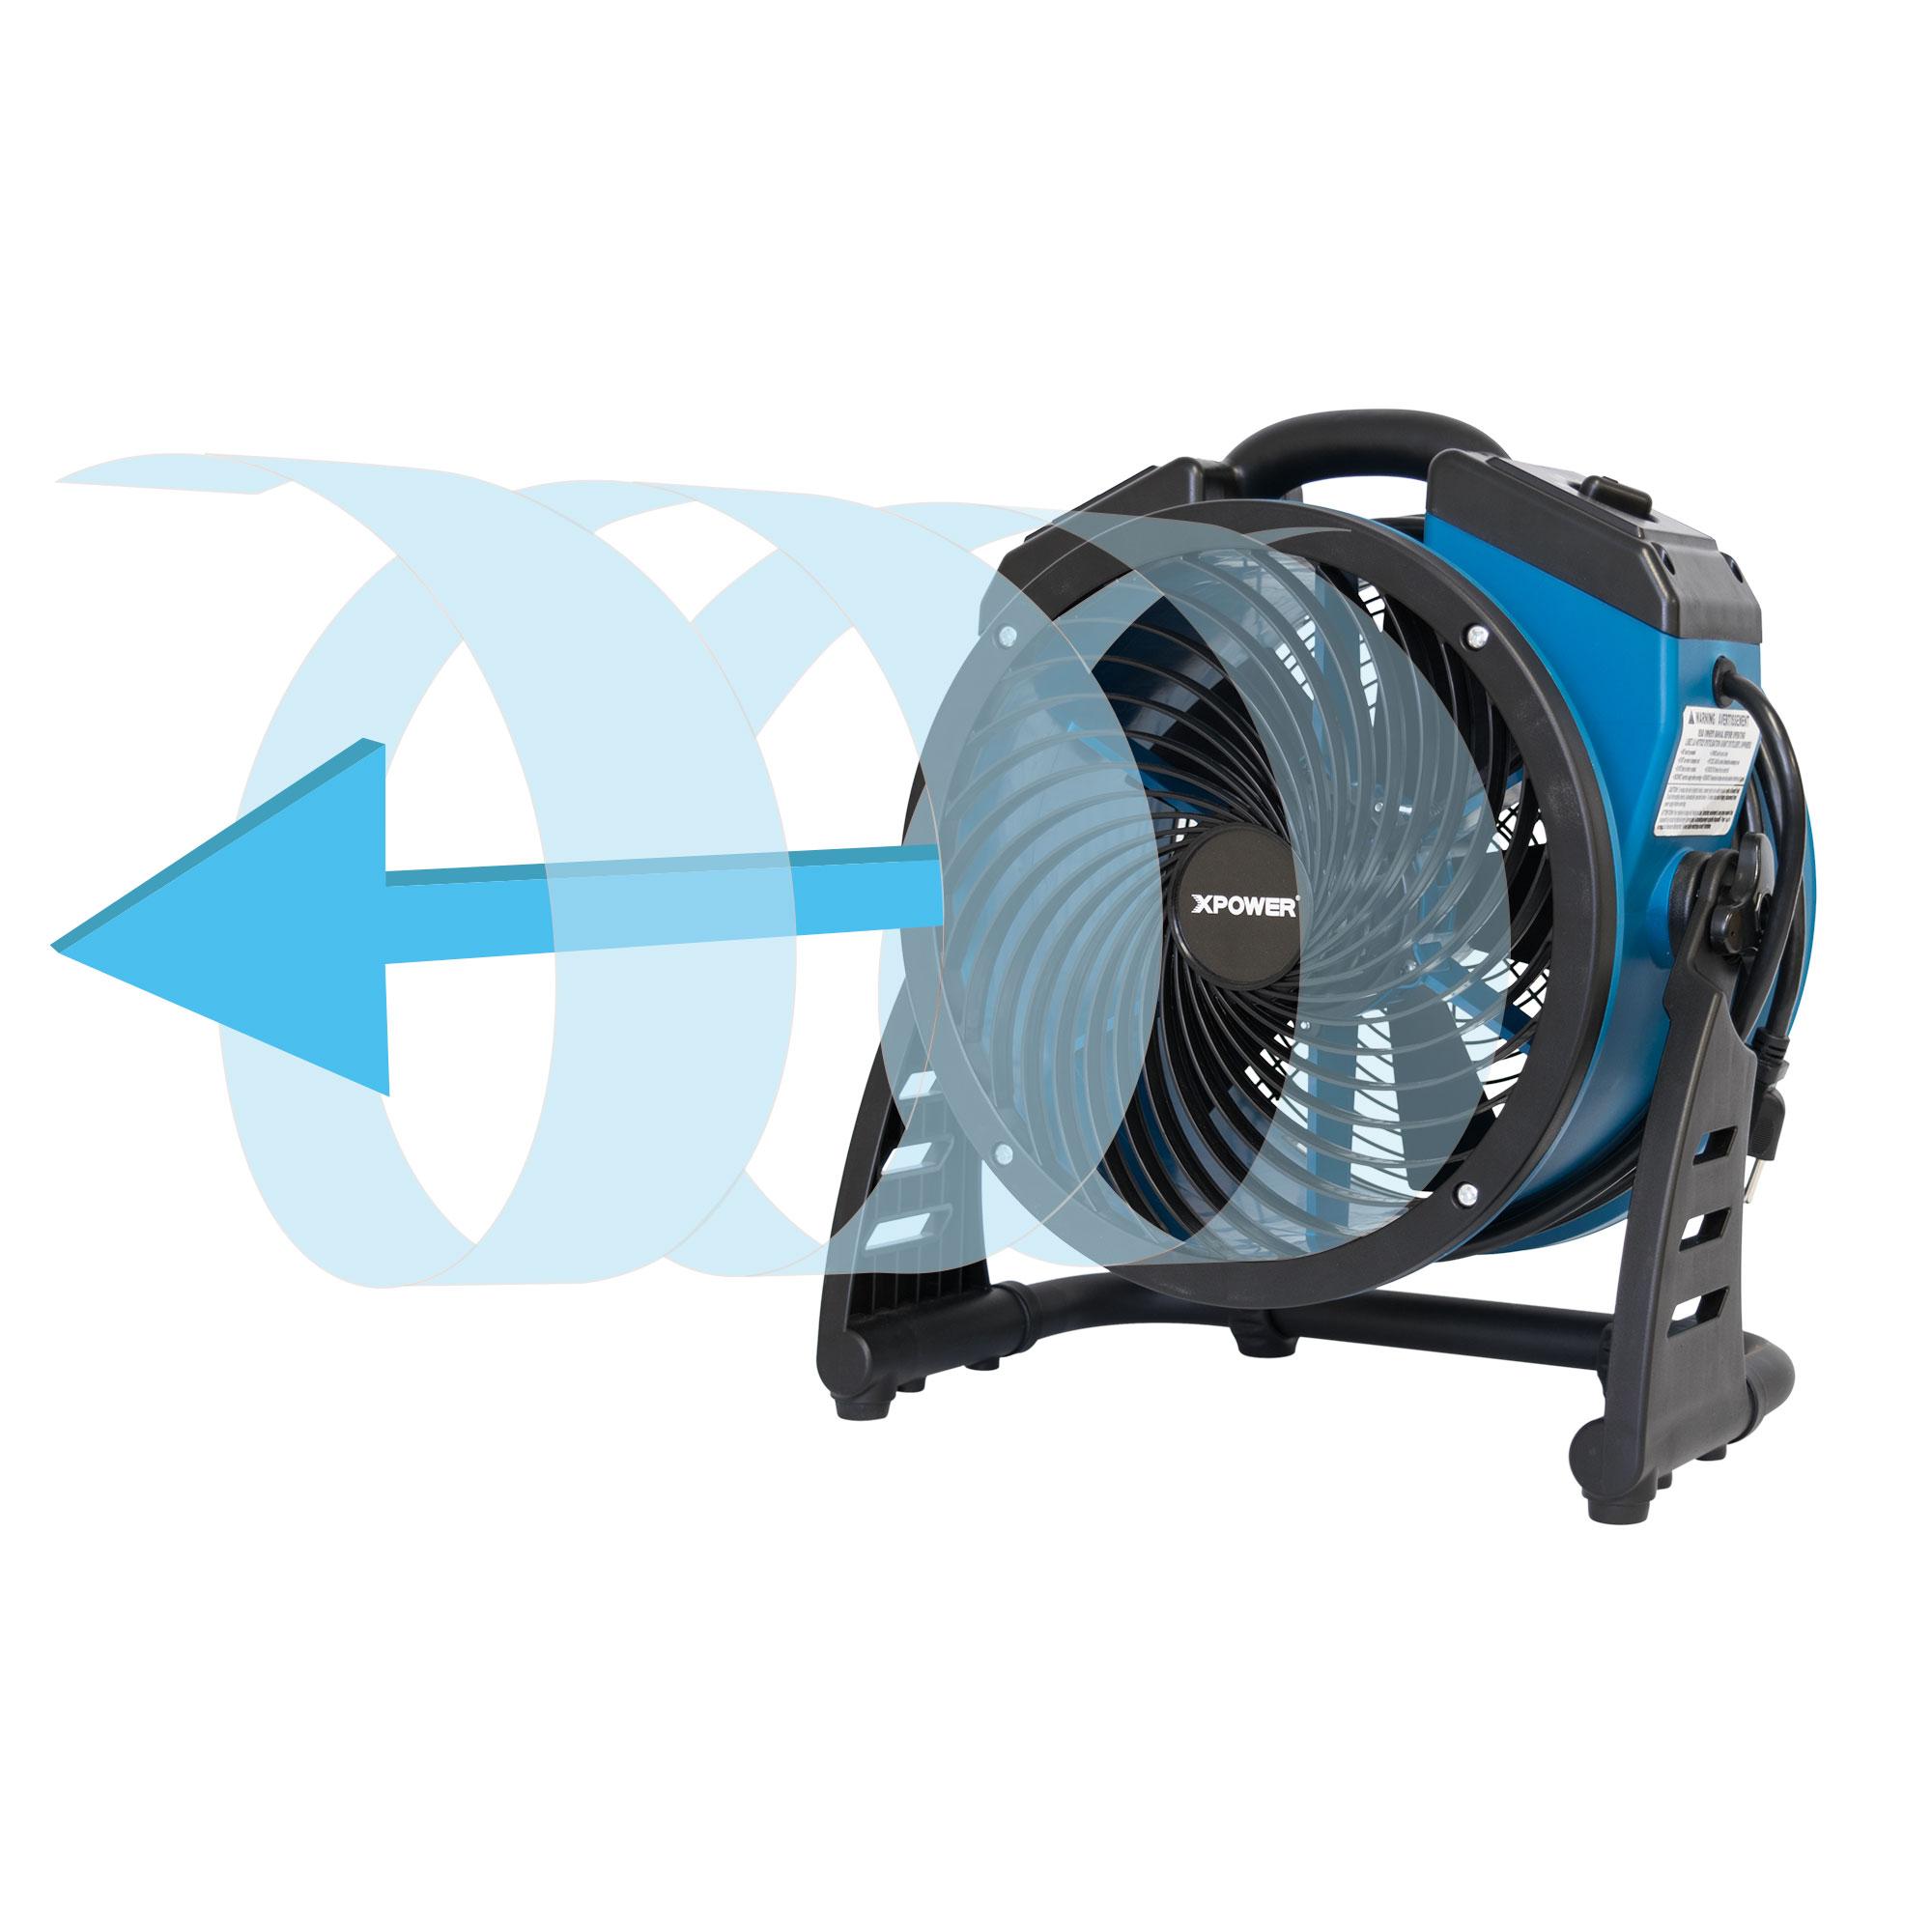 Axial Air Mover : Xpower p ar industrial axial air mover